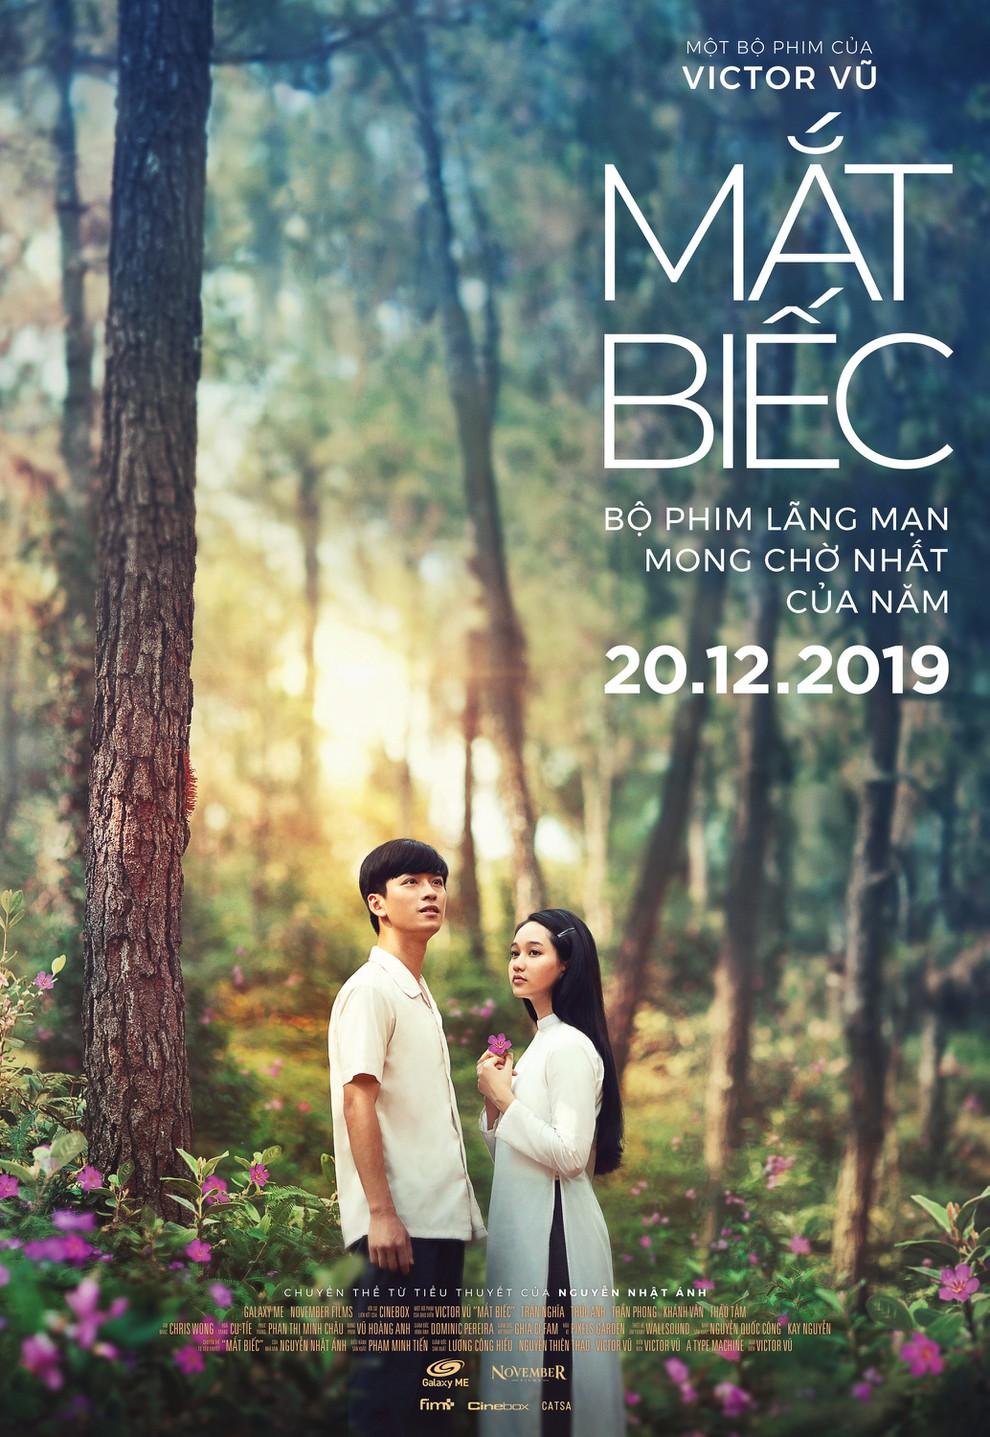 phim-chieu-rap-12-2019.4-elleman